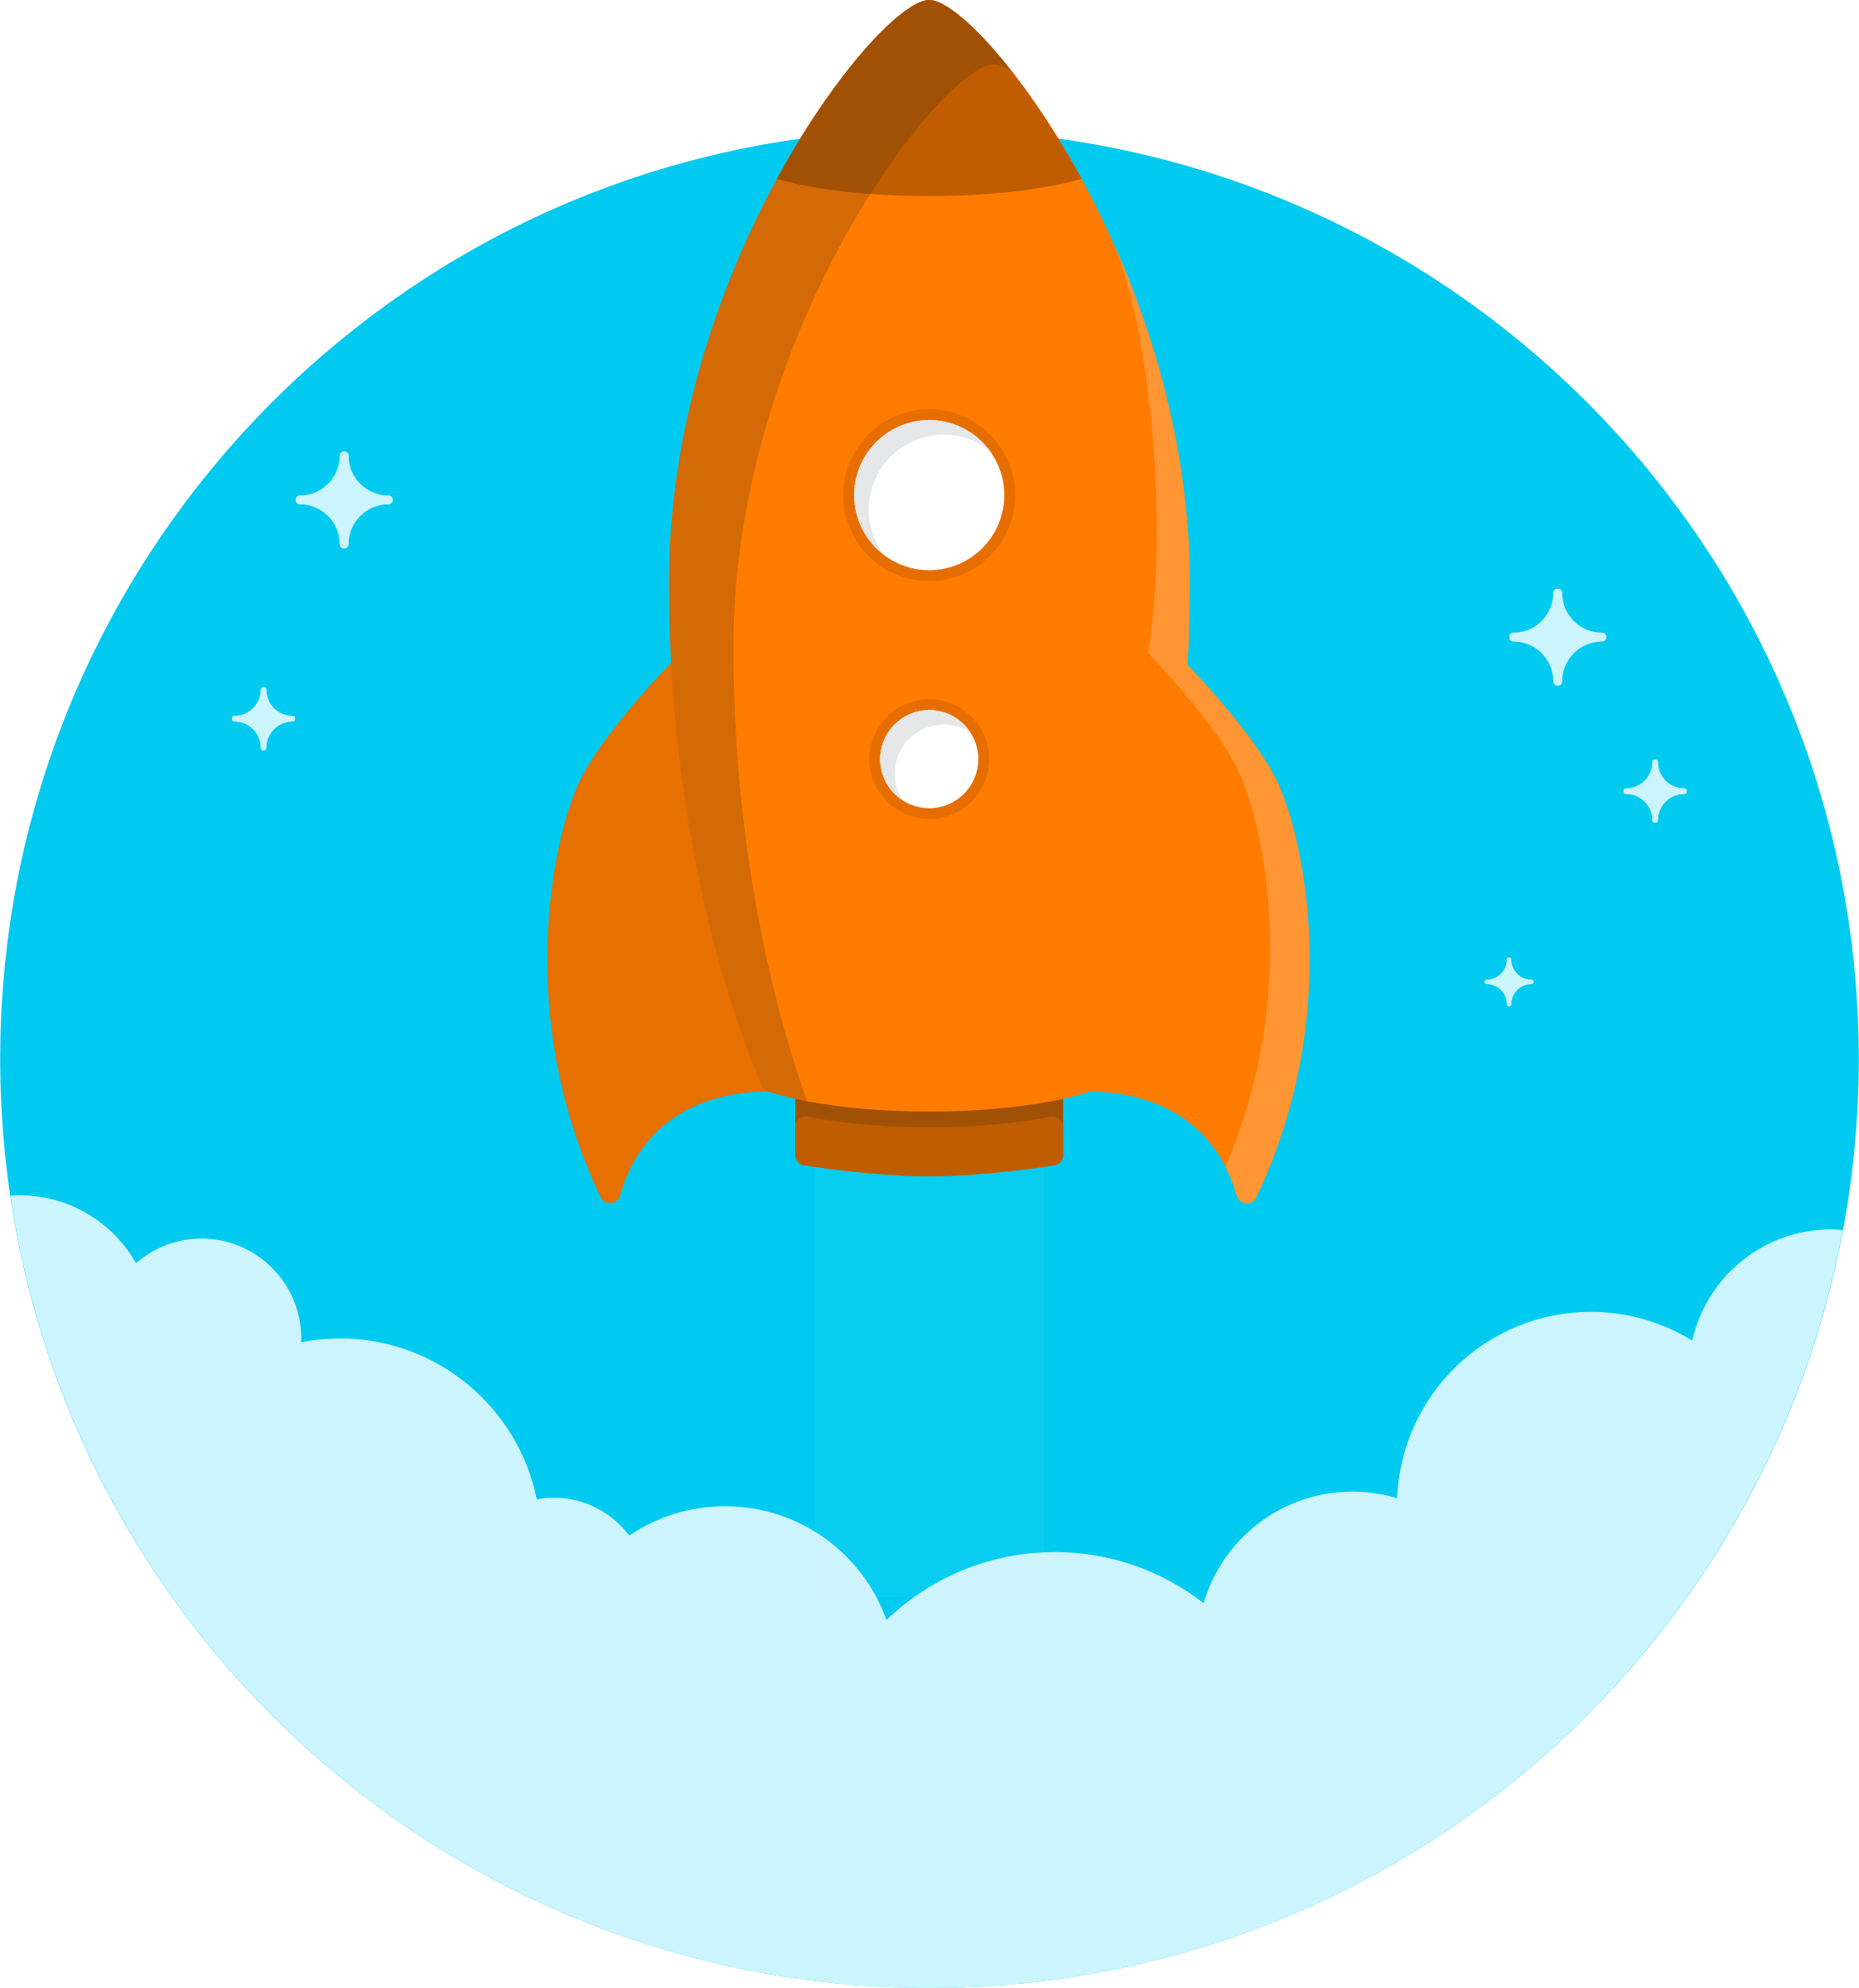 Spaceship clipart tiny. Rocket rockets pinterest filing